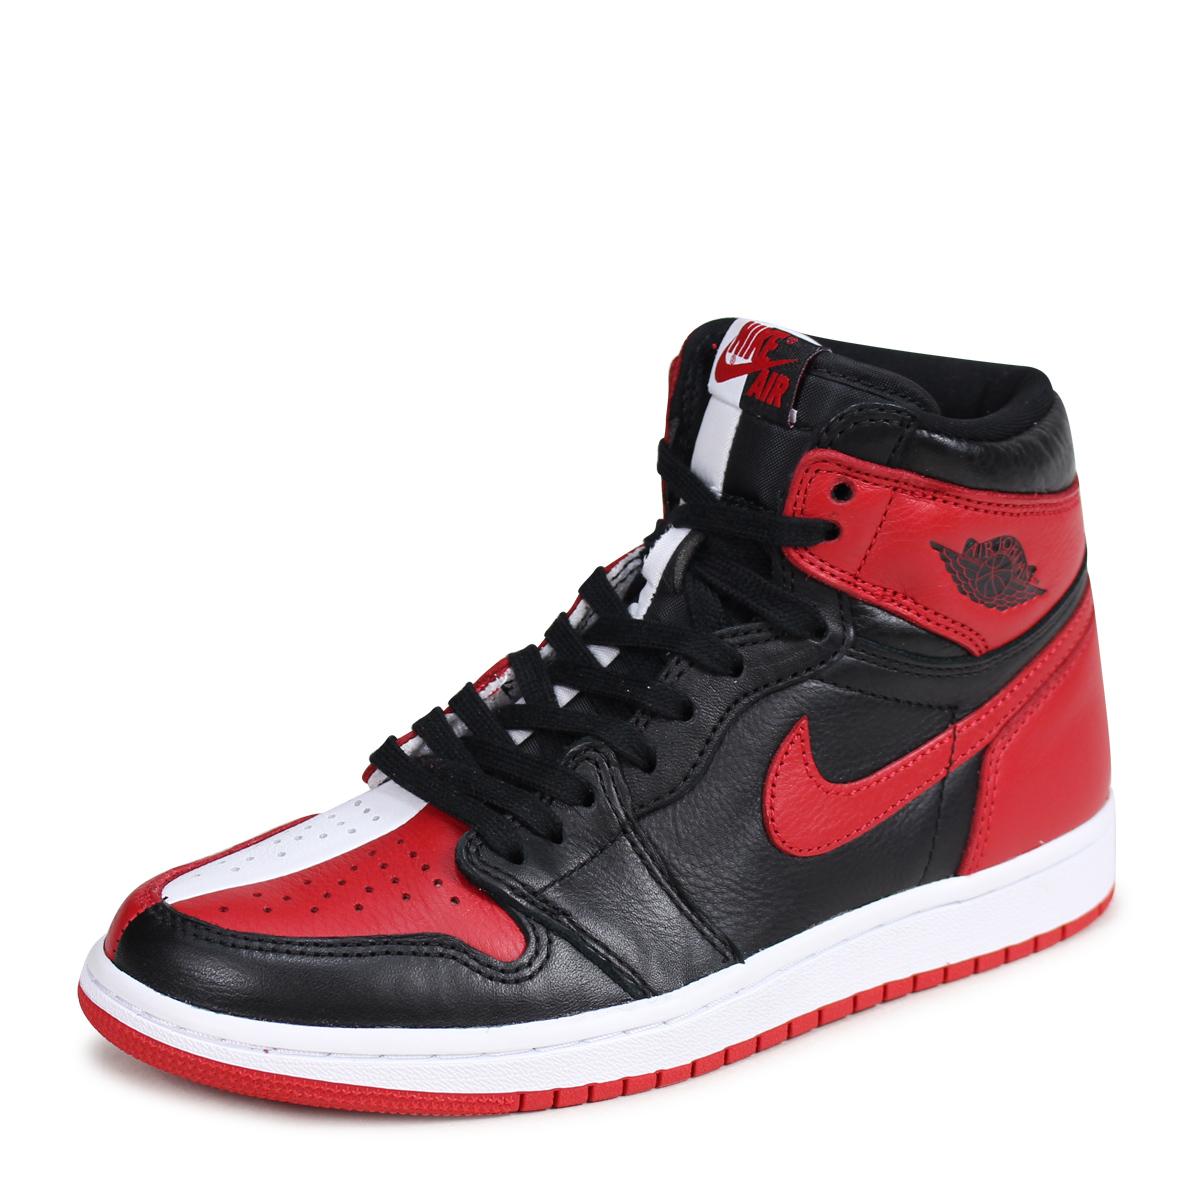 f3039885061f NIKE AIR JORDAN 1 RETRO HIGH OG HOMAGE TO HOME Nike Air Jordan 1 nostalgic  Haile Dis sneakers 861